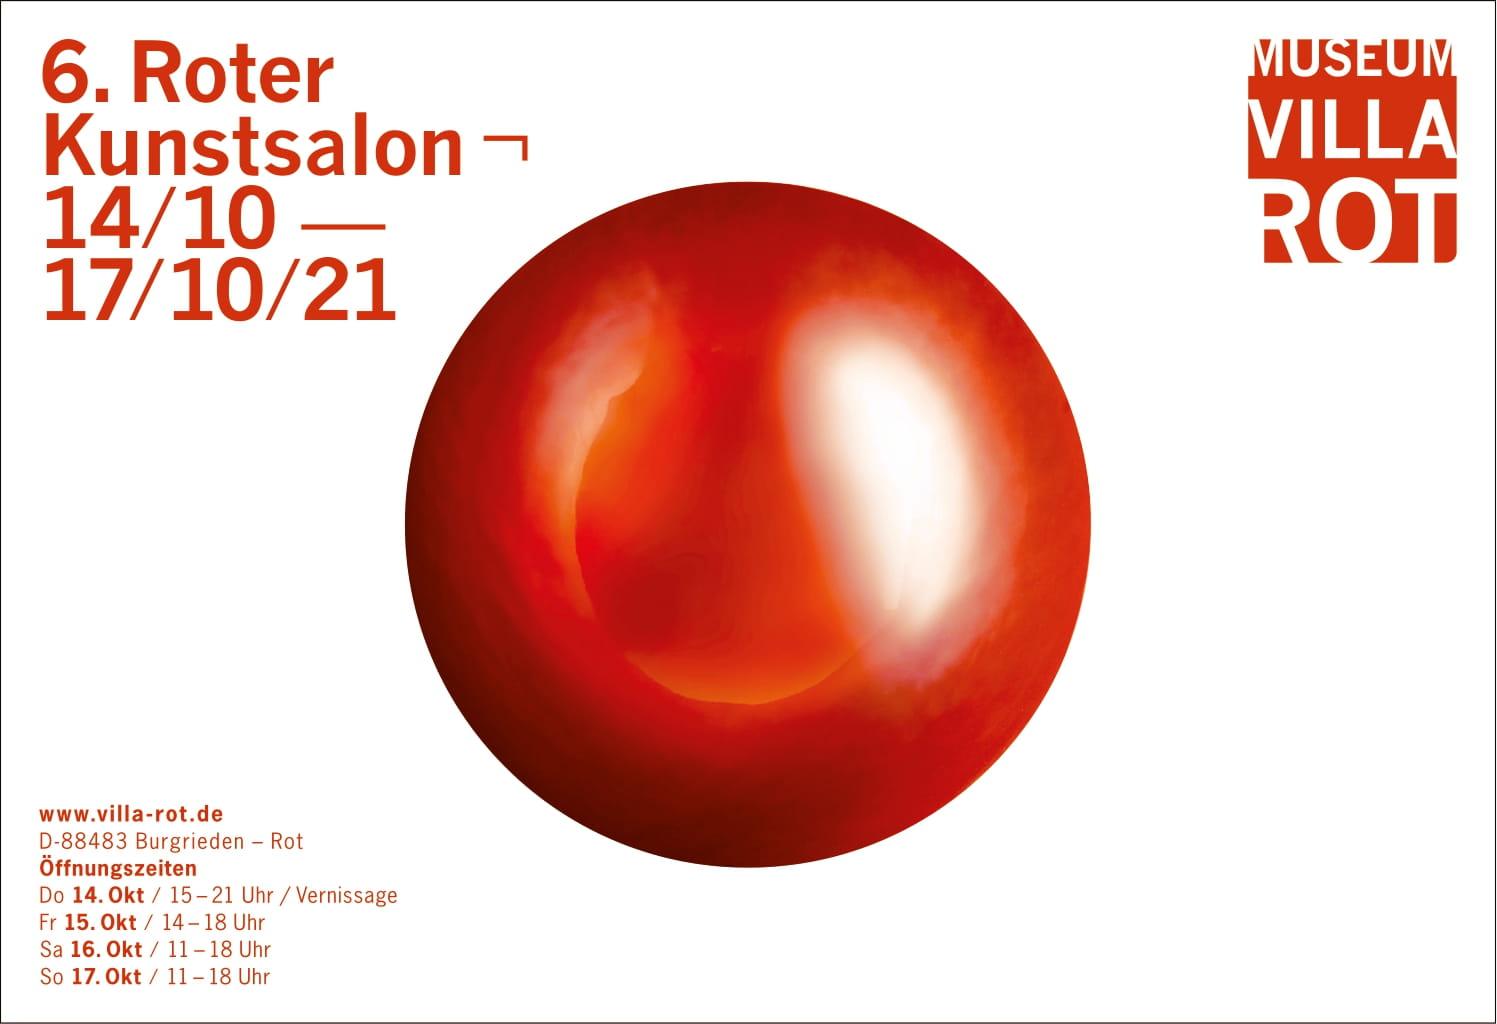 6. Roter Kunstsalon